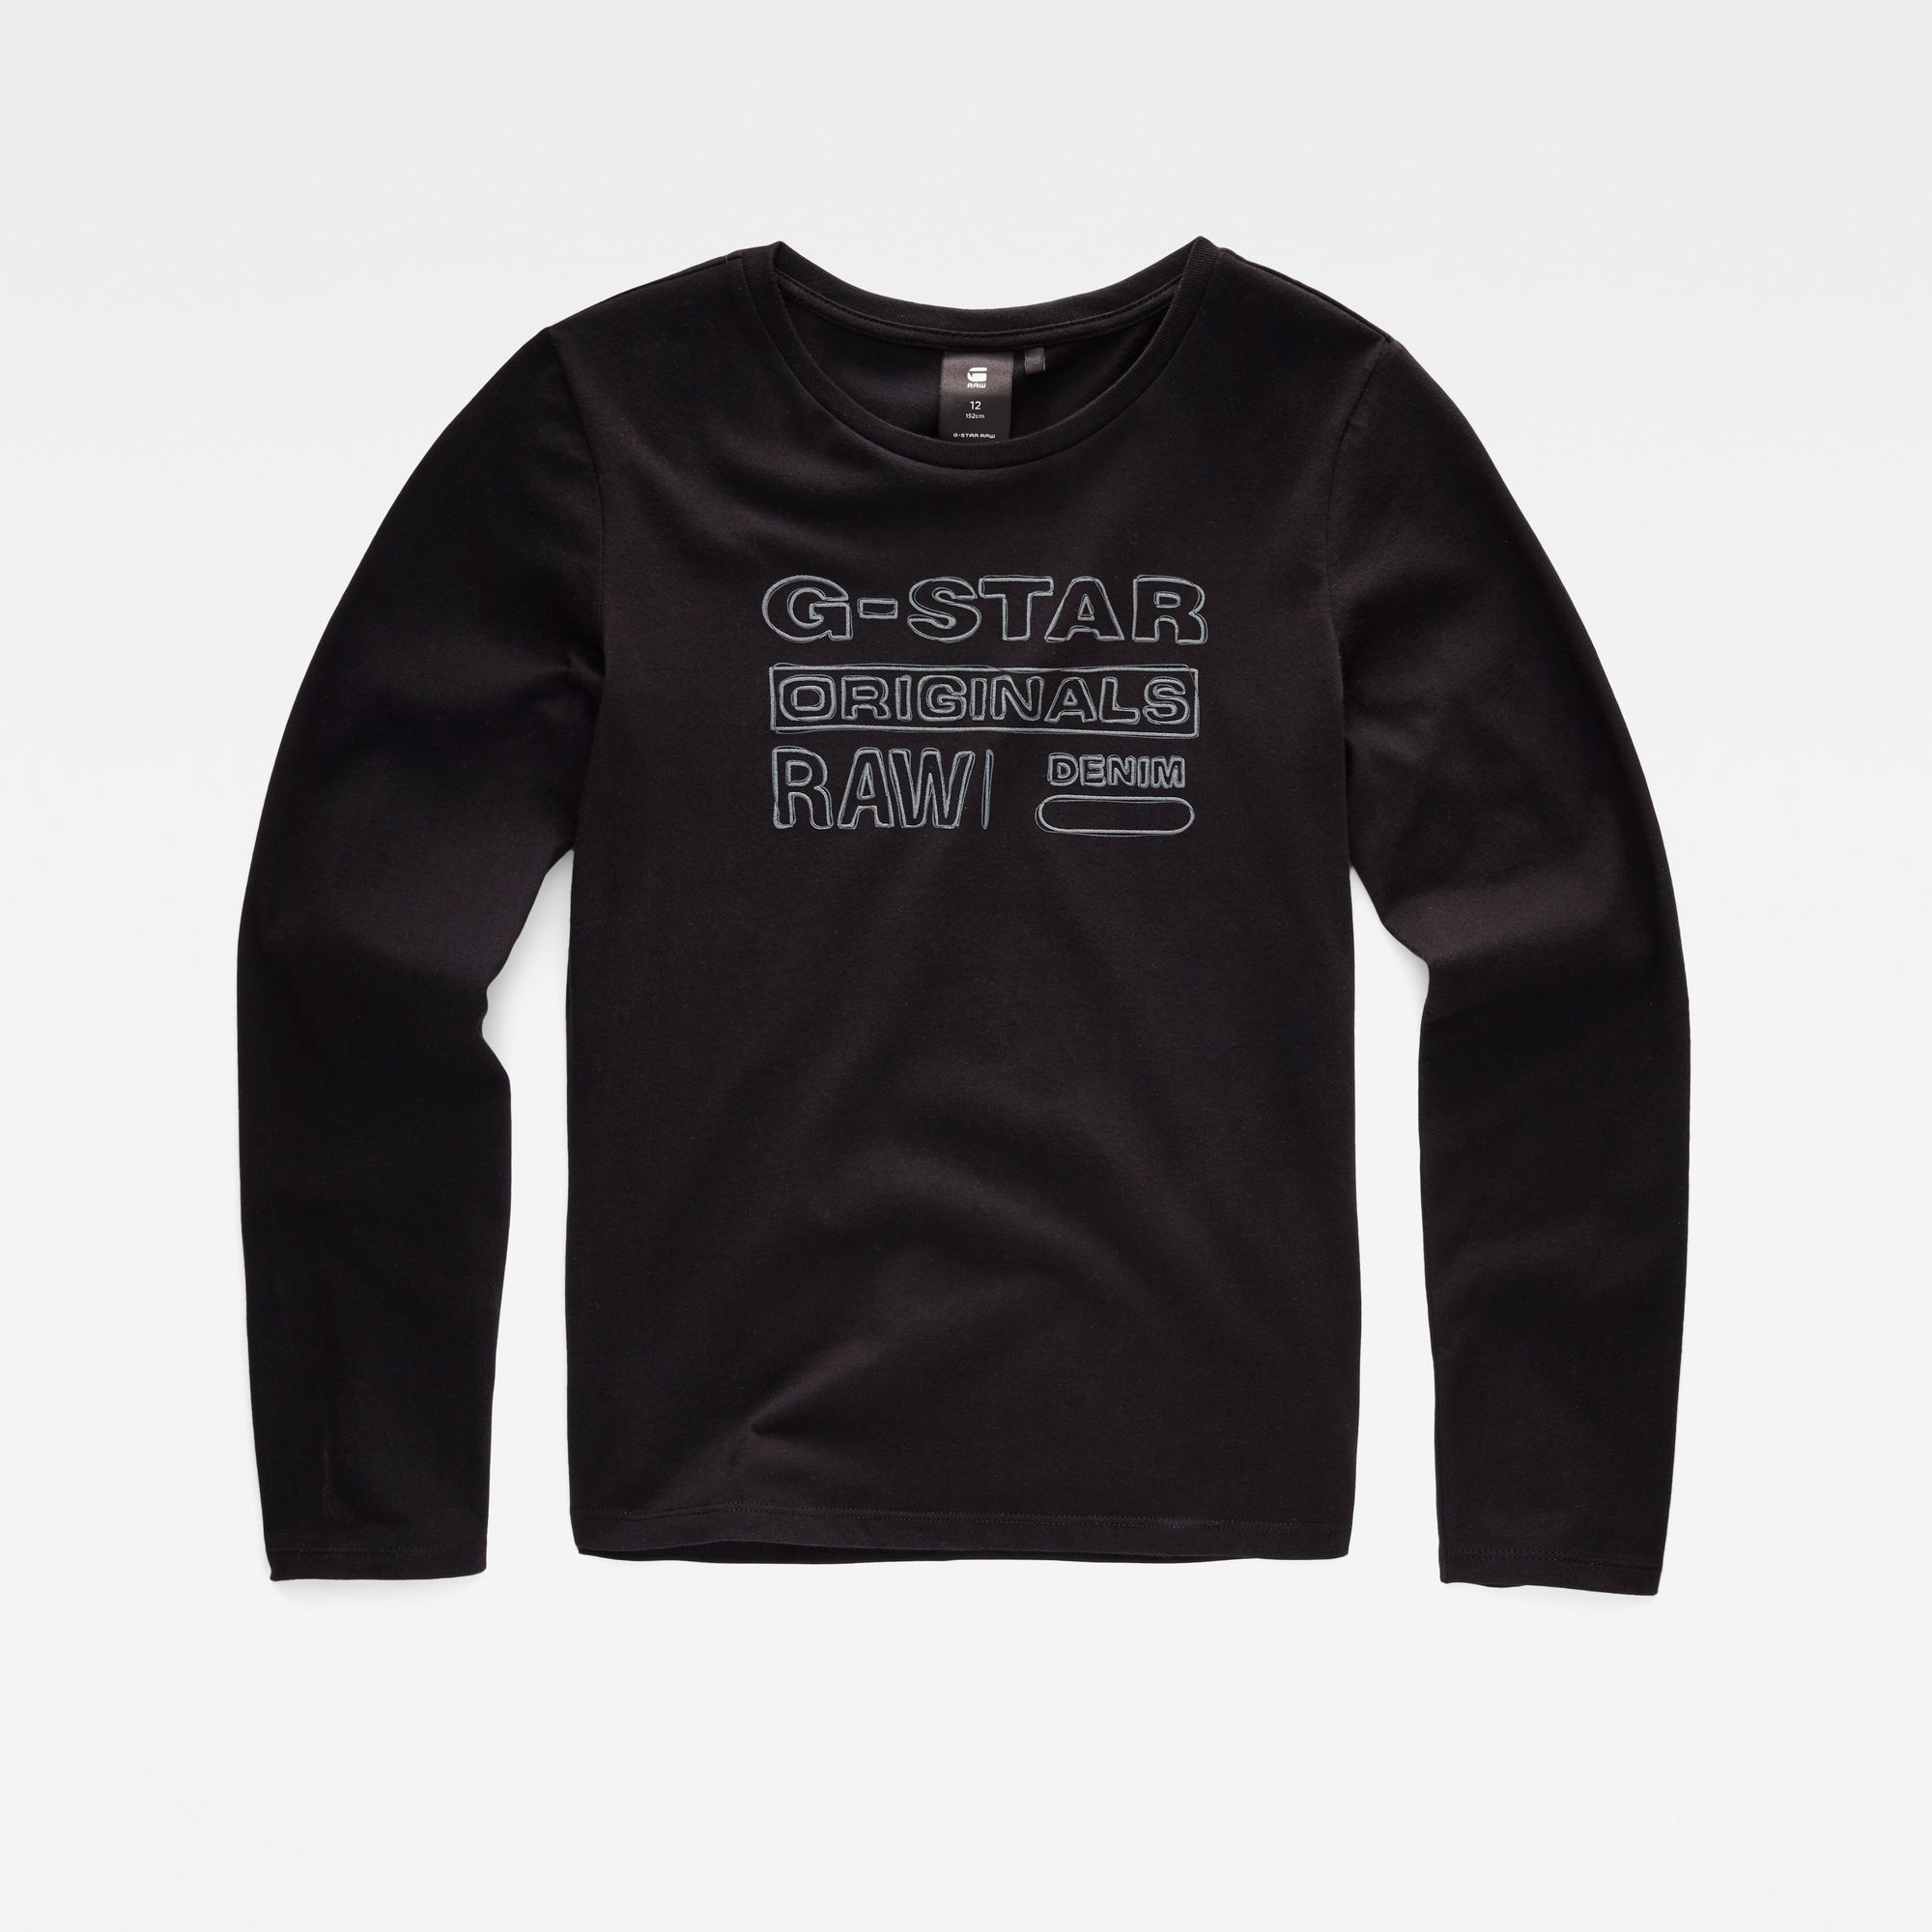 G-Star RAW Meisjes T-shirt Zwart